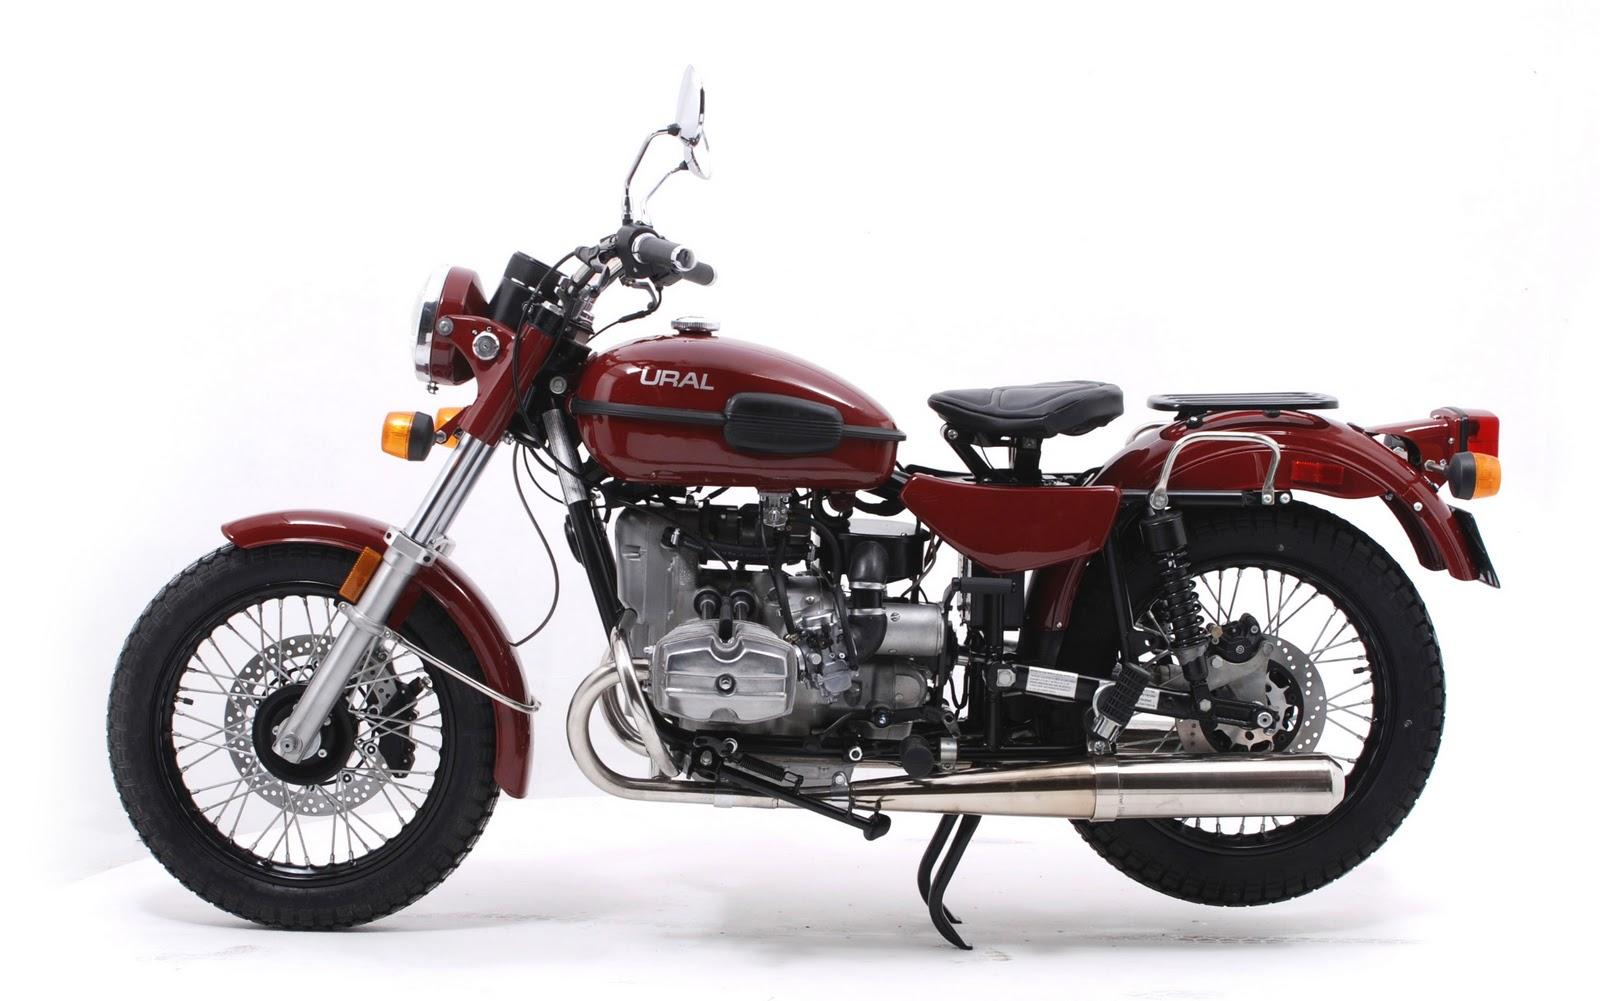 правило, картинки про мотоцикл урал лучшие обои